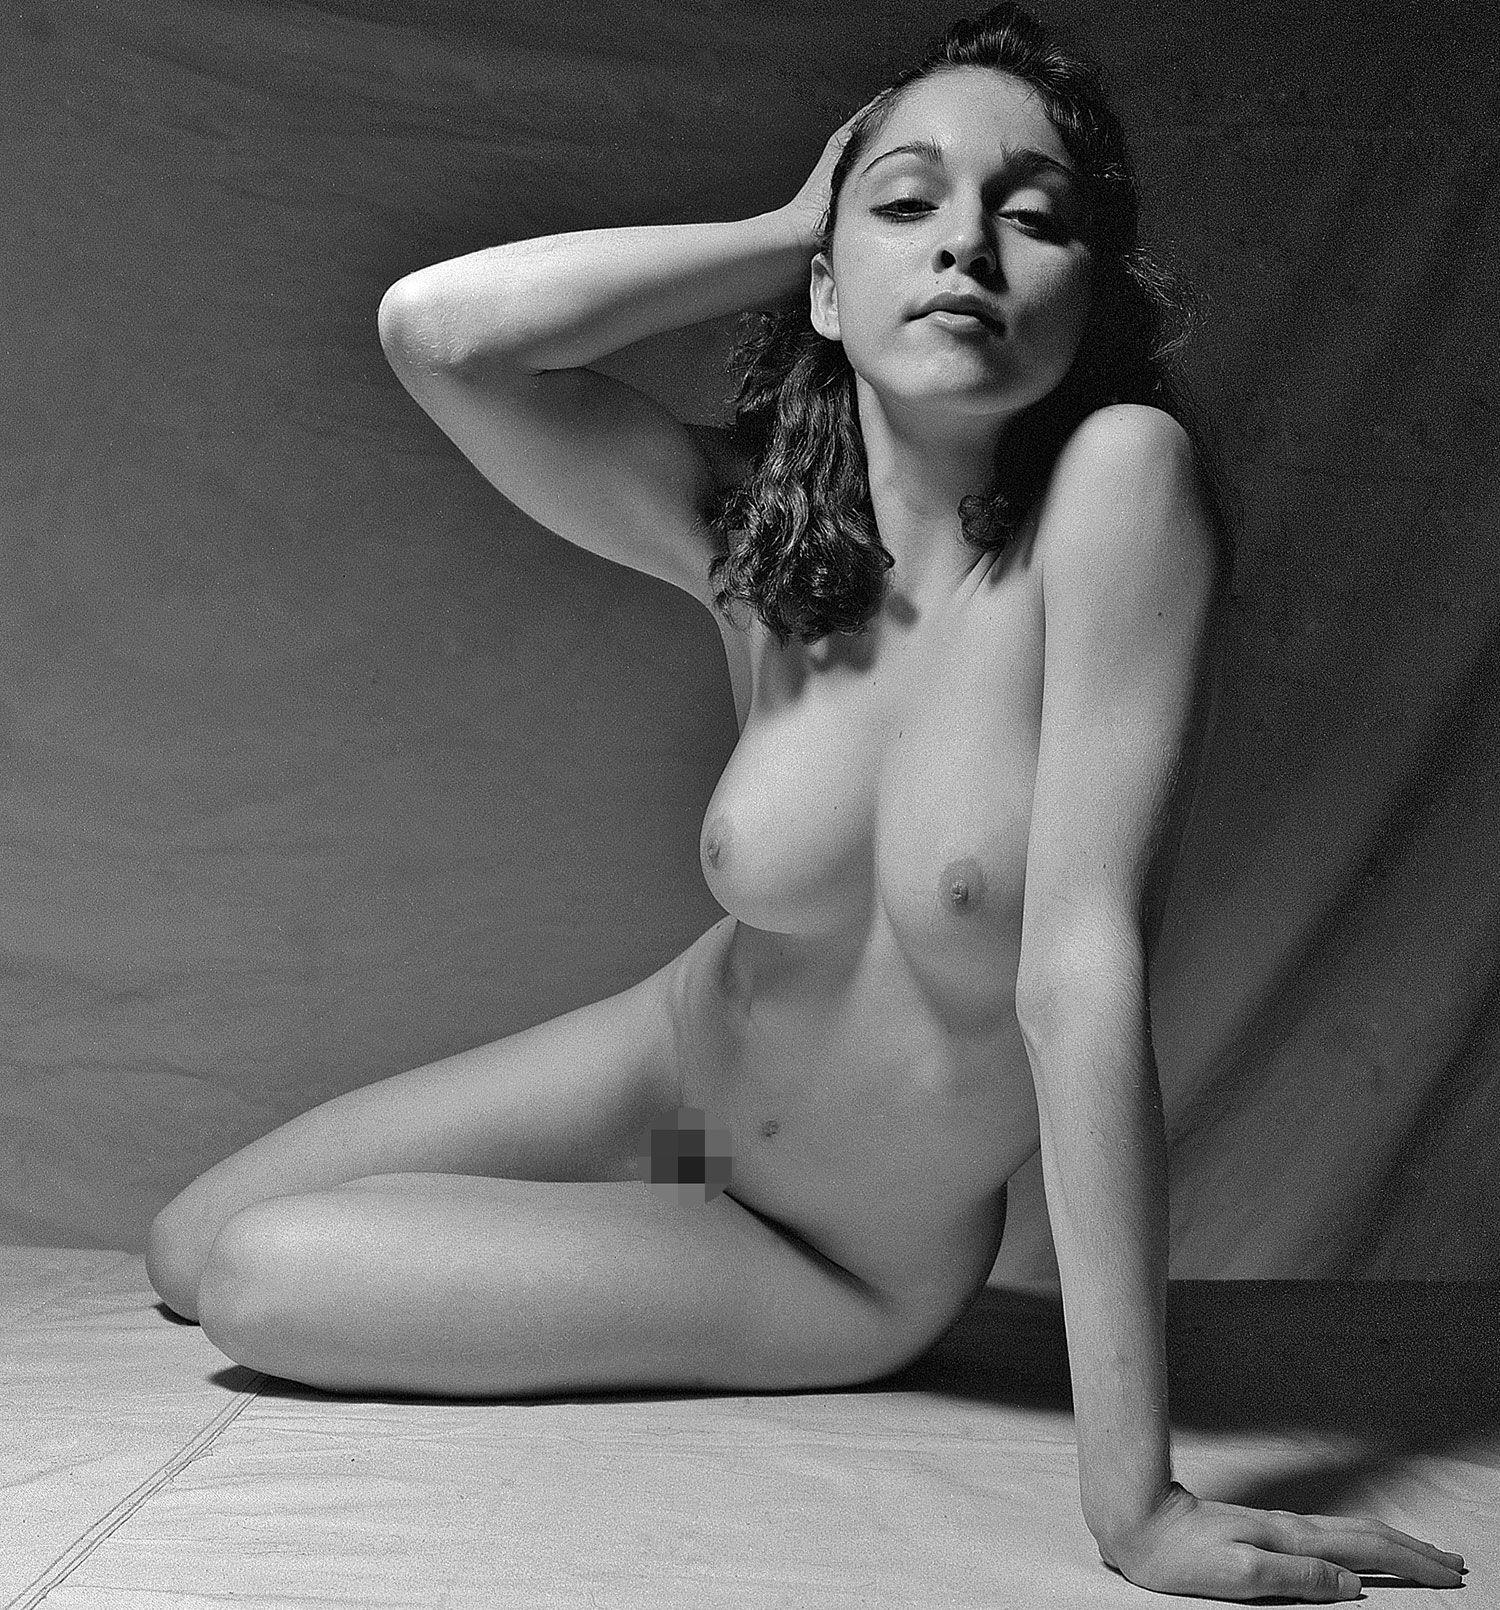 Nude mature african women